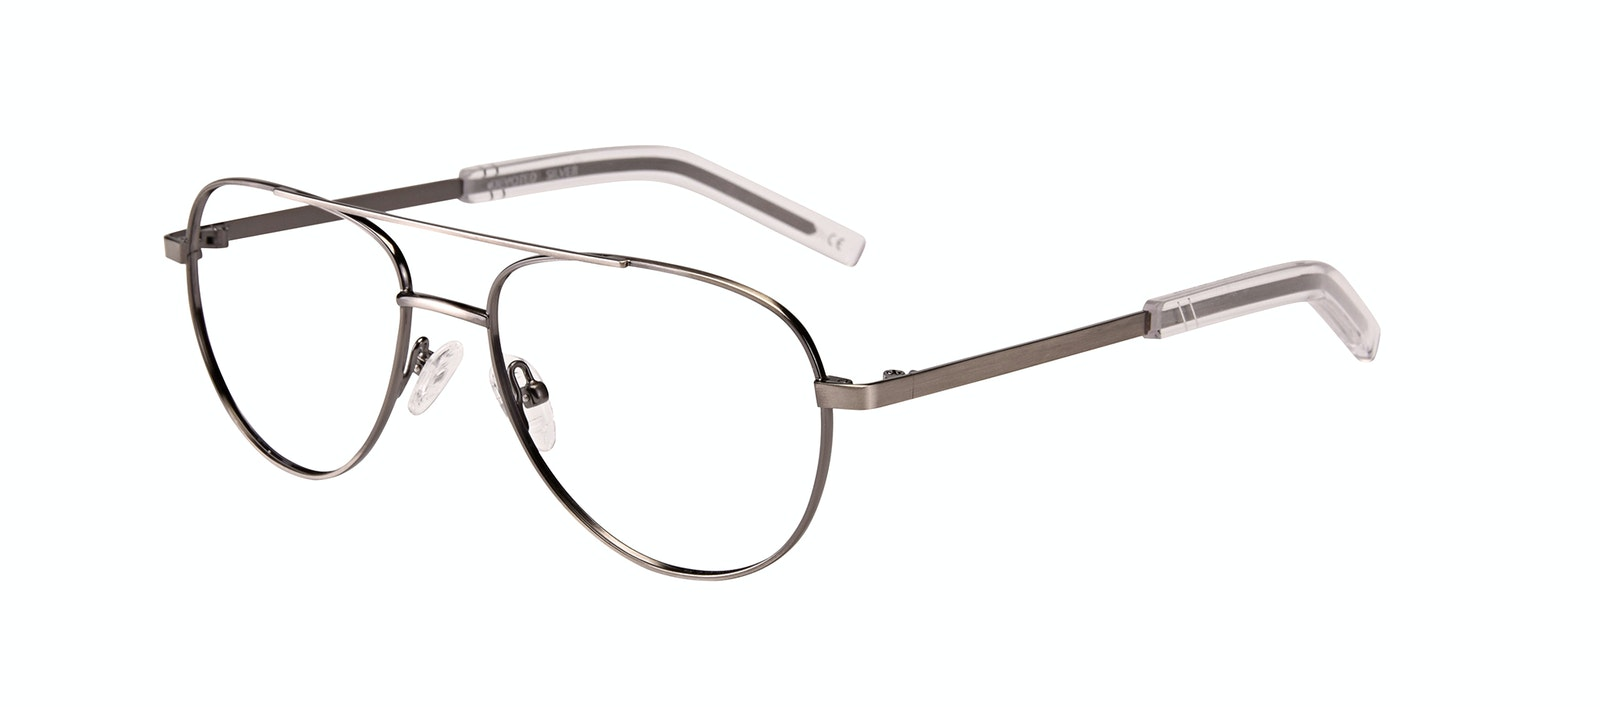 Affordable Fashion Glasses Aviator Eyeglasses Men Devoted Silver Tilt